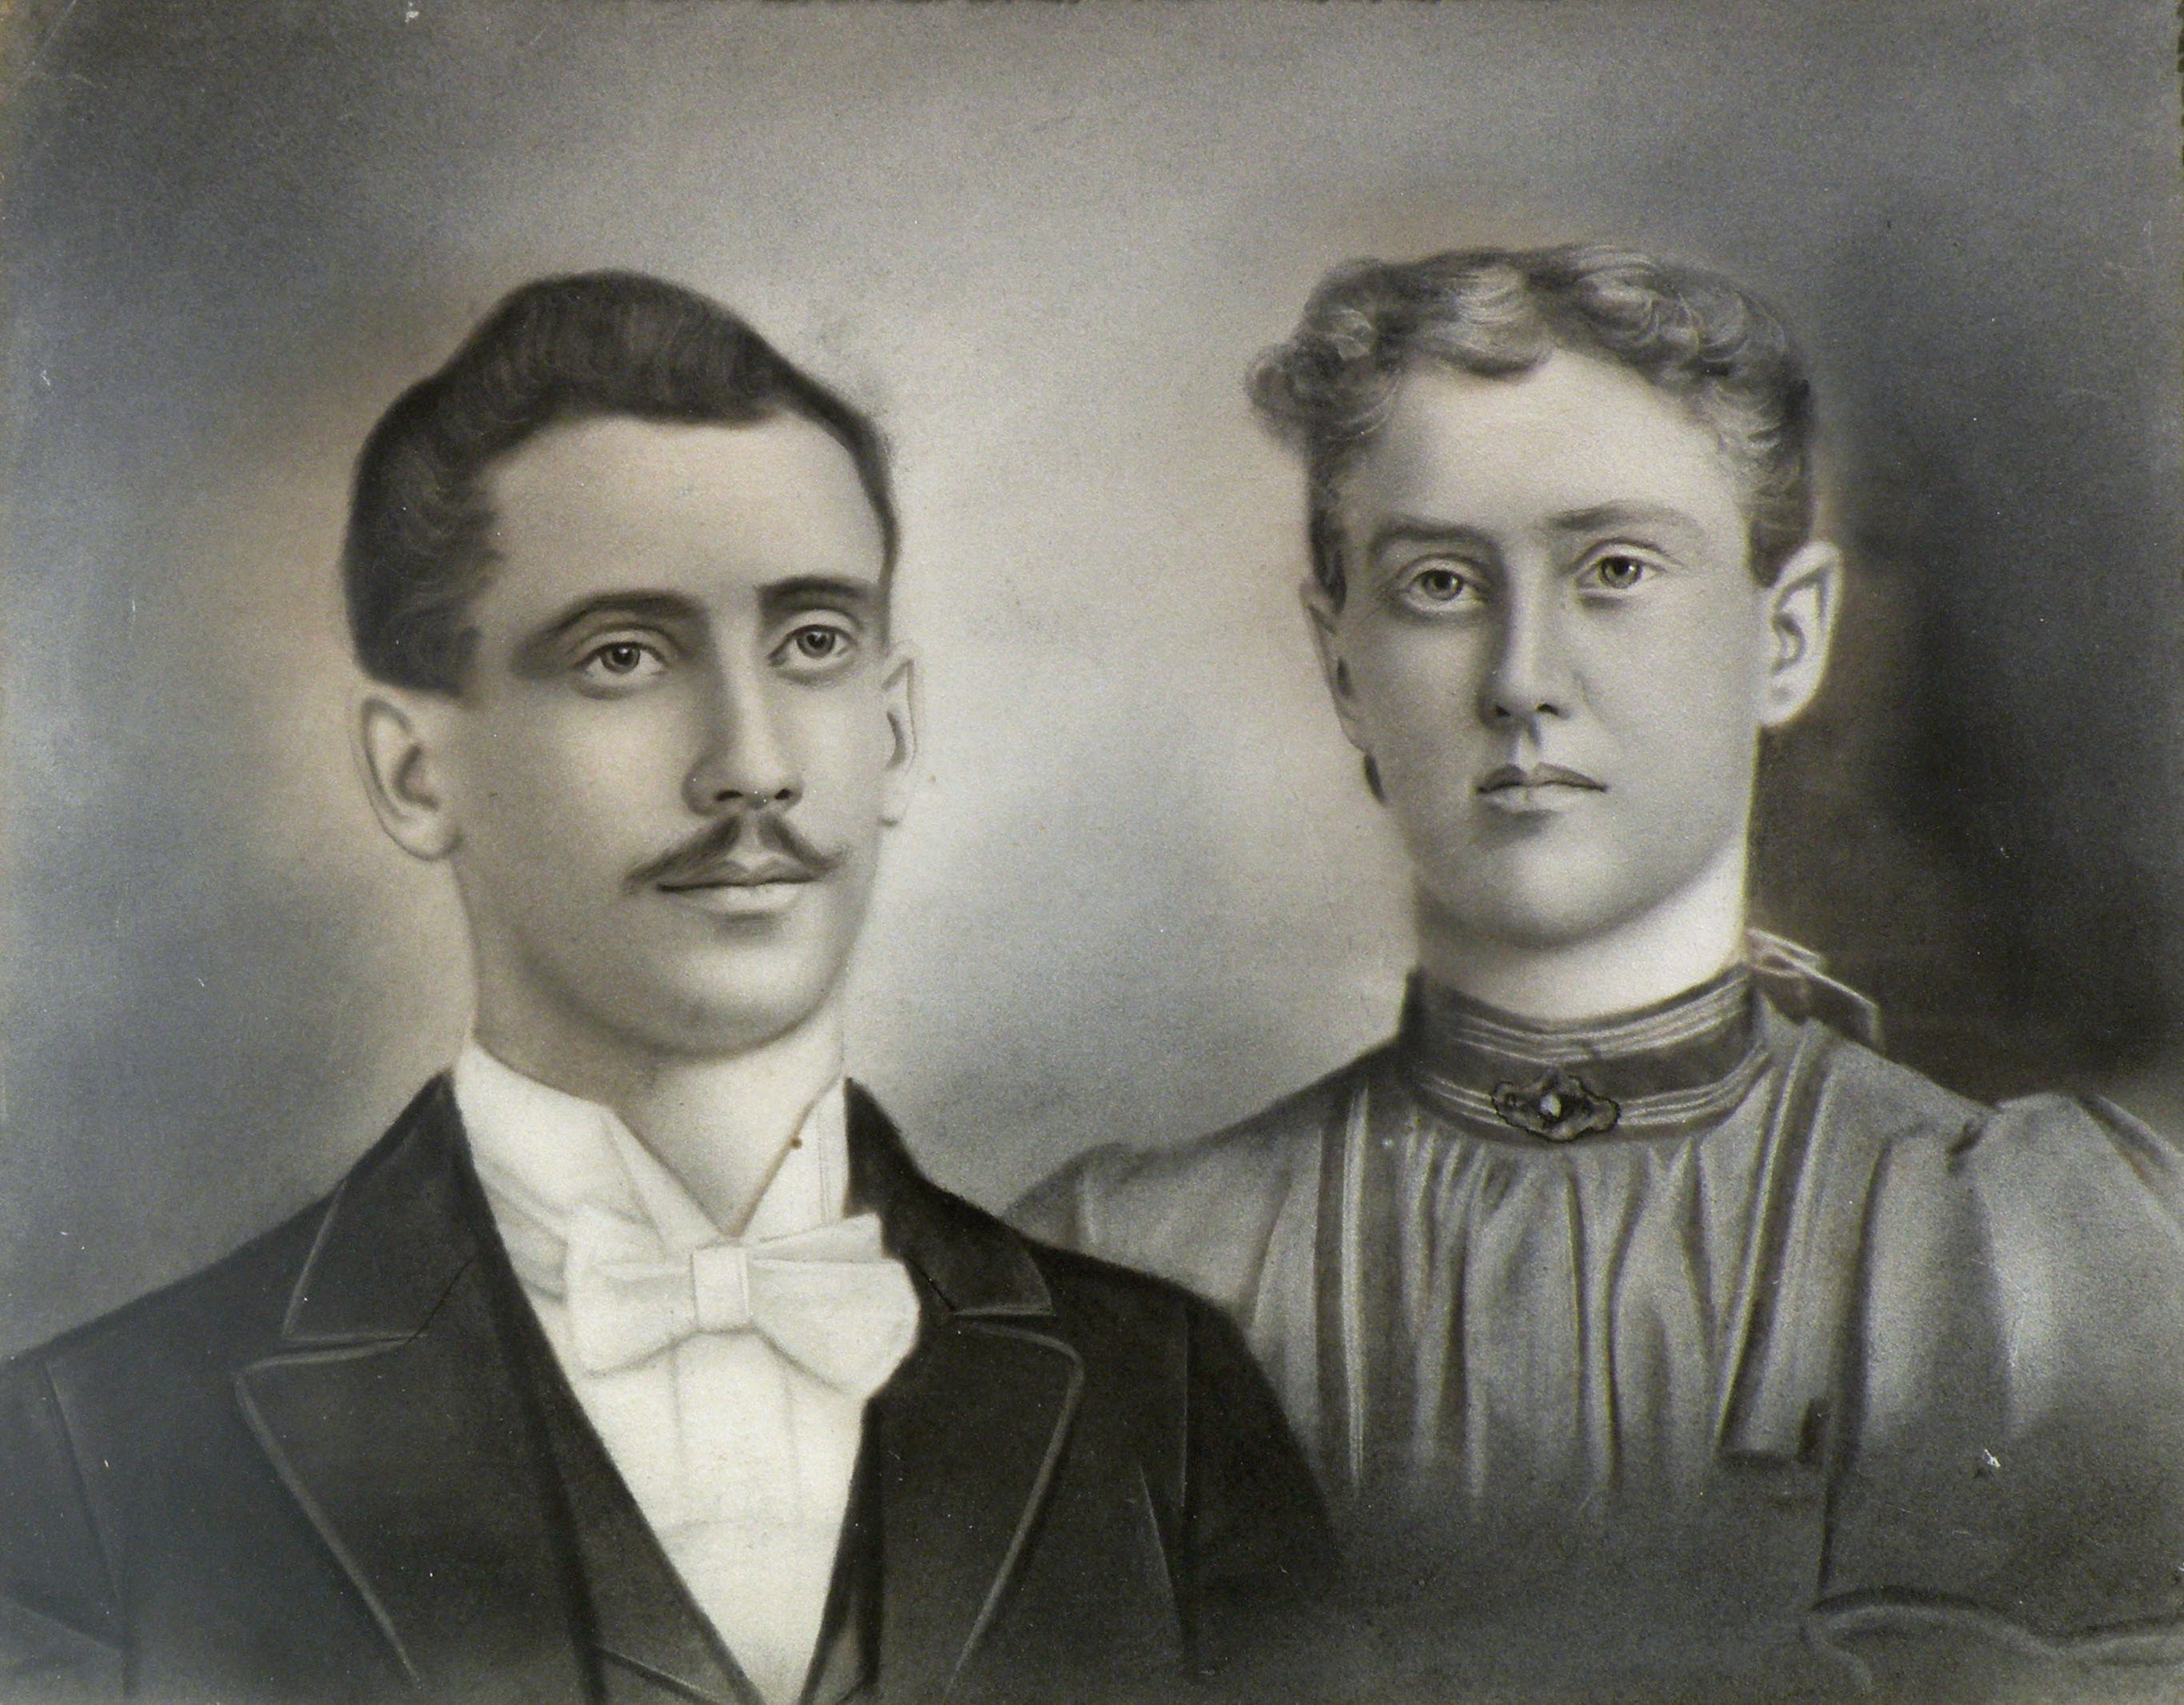 Allen Stevens Mudersbach